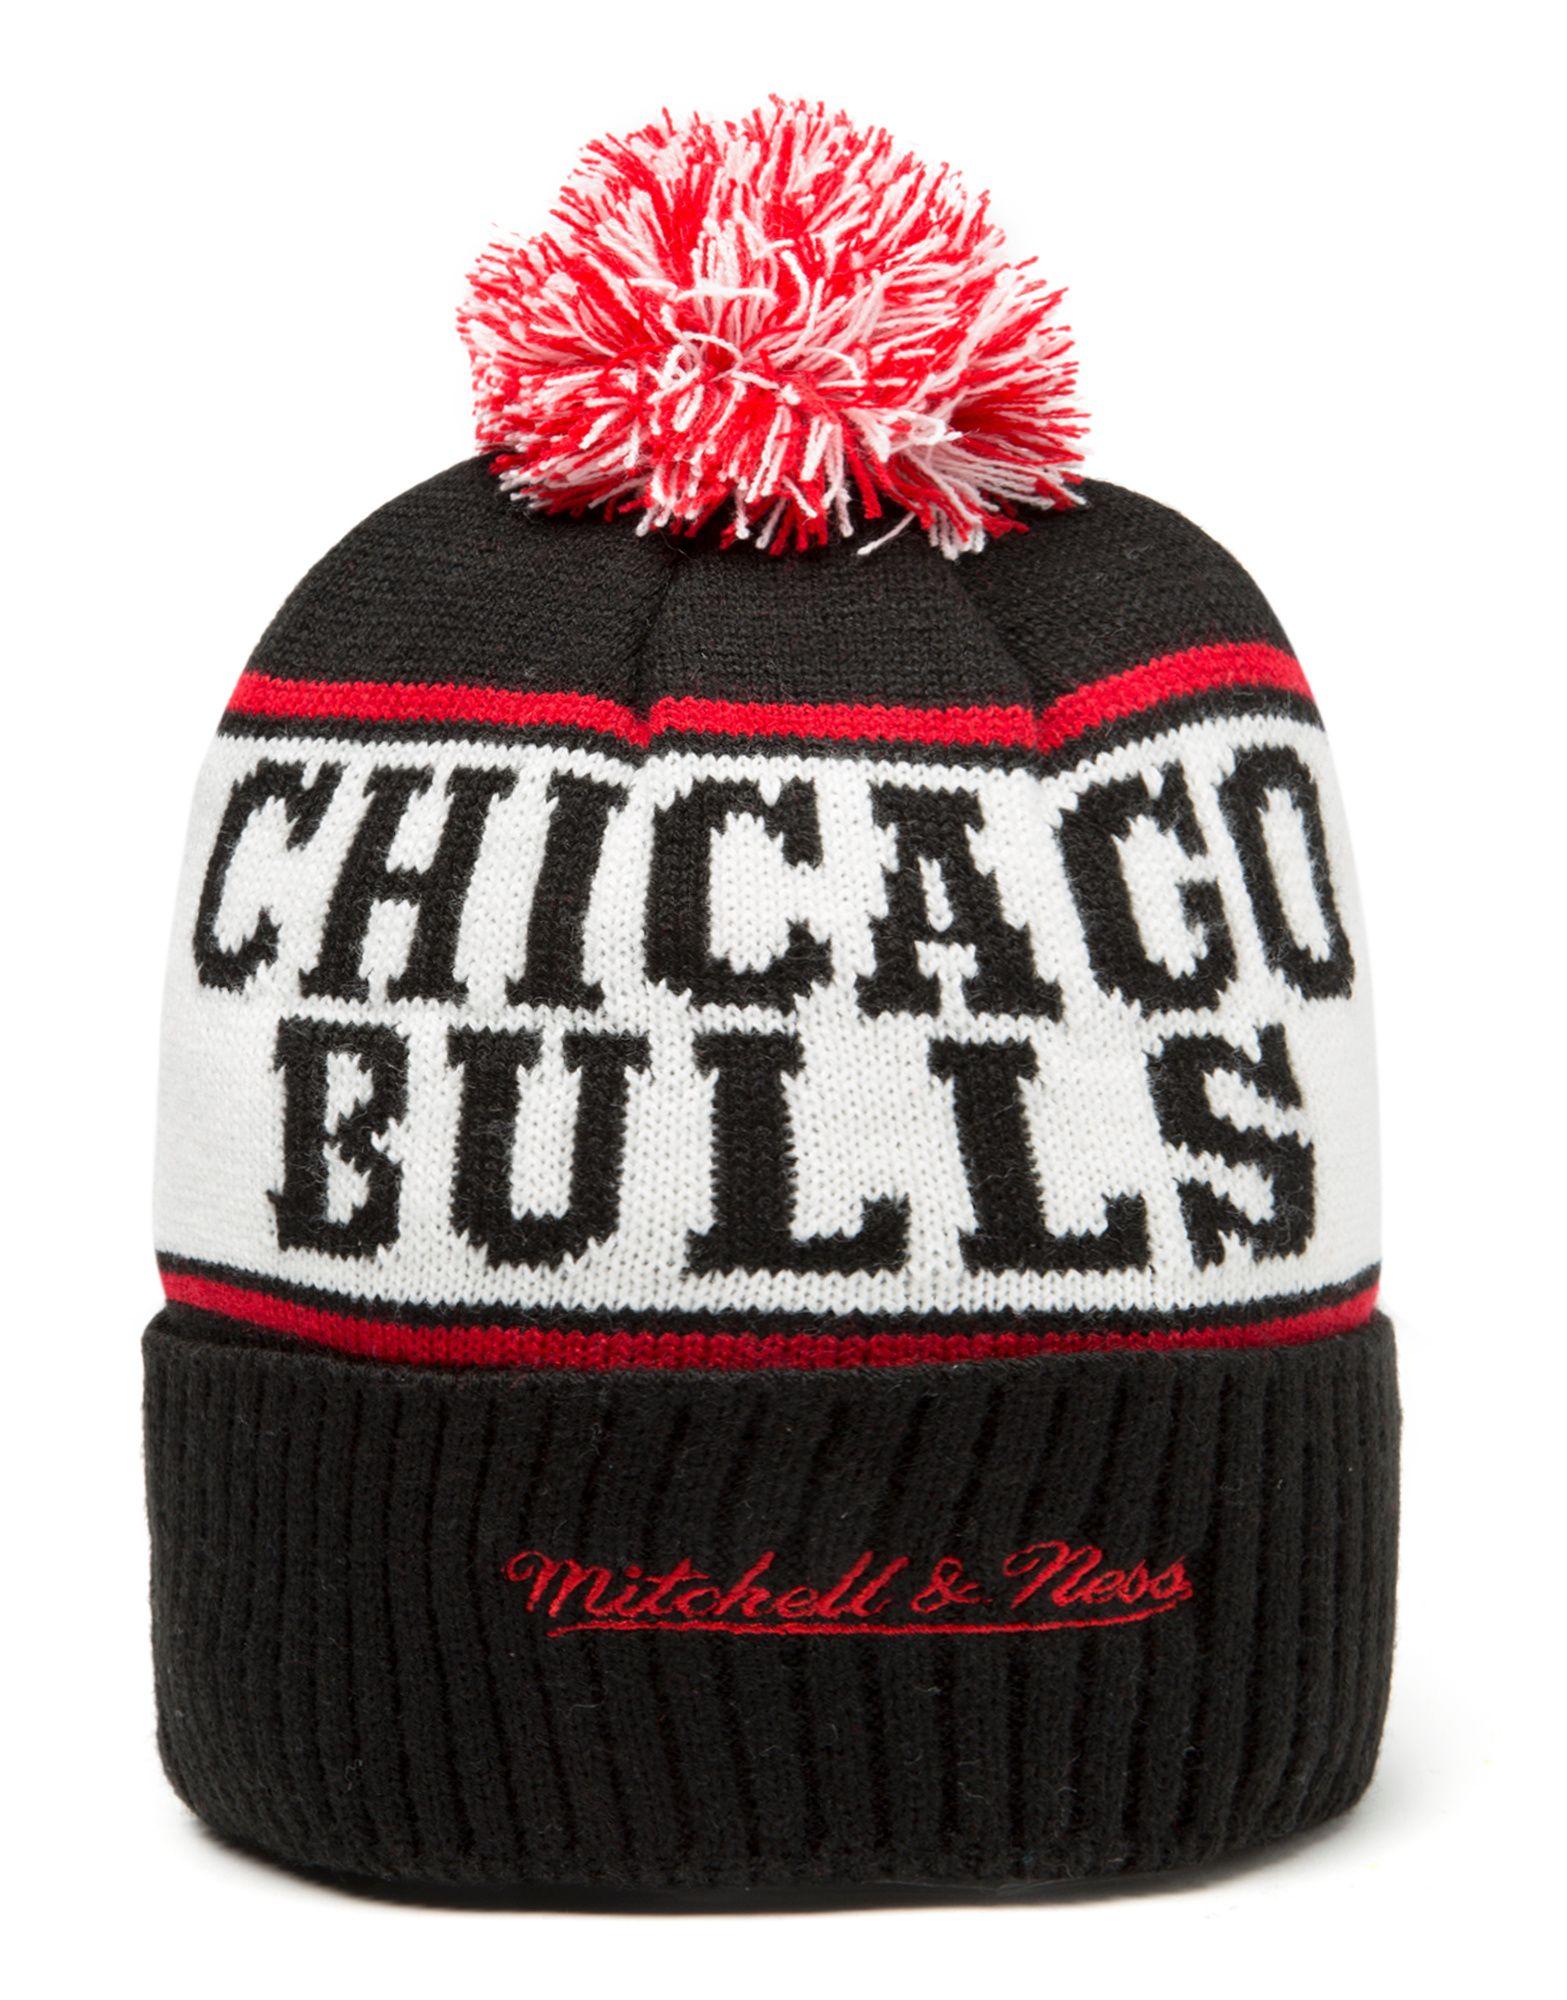 Mitchell & Ness NBA Chicago Bulls Wordmark Bobble Hat